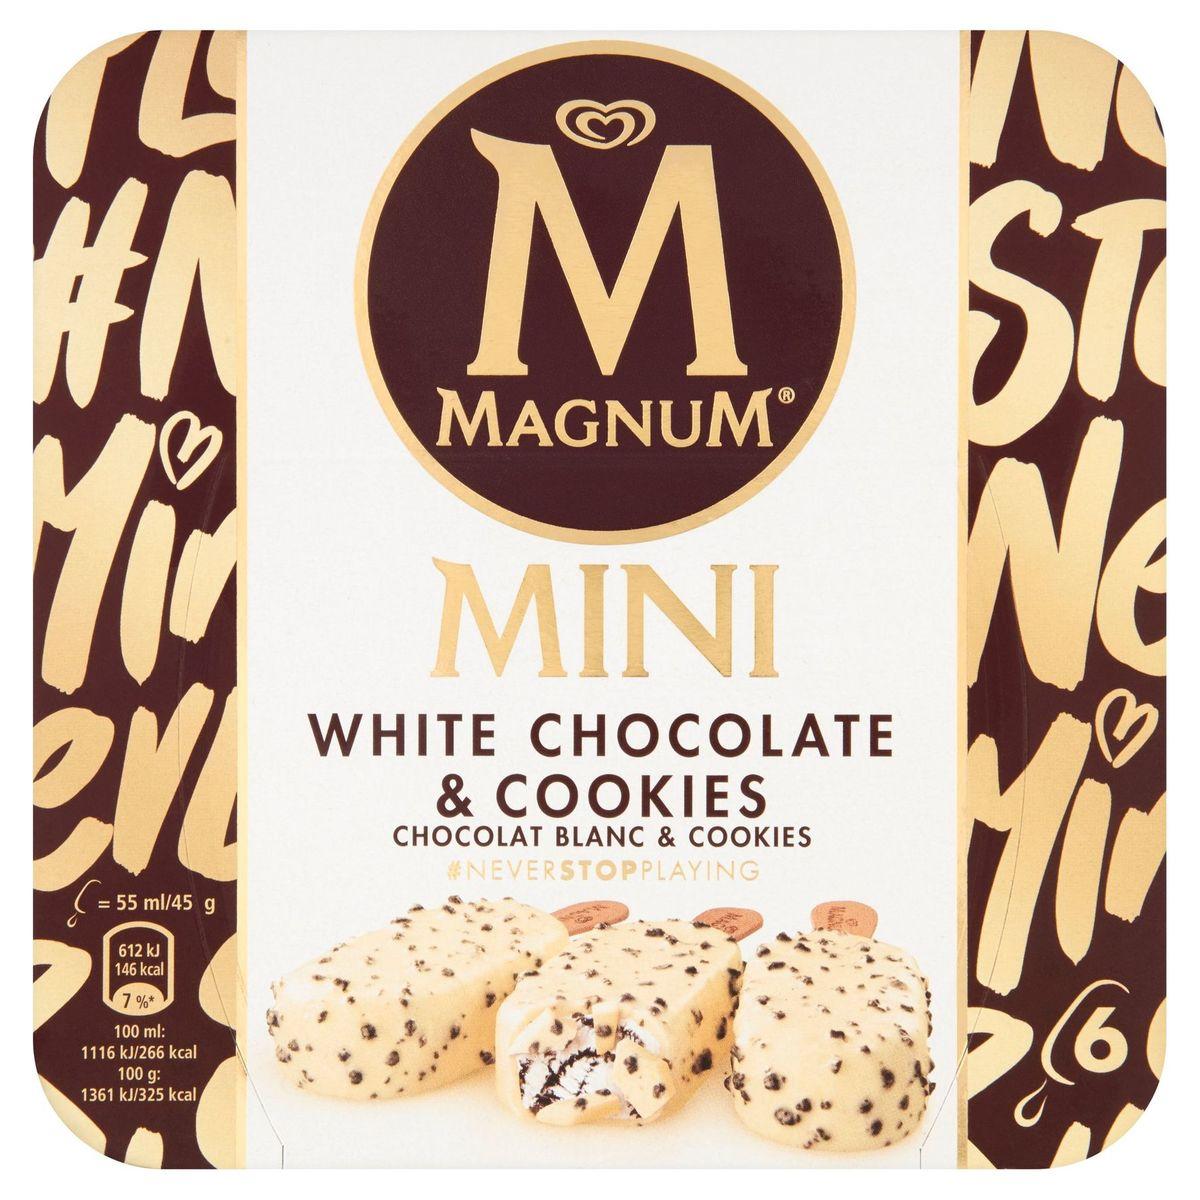 Magnum Ola Ijs Multipack White Chocolate & Cookies 6 x 55 ml